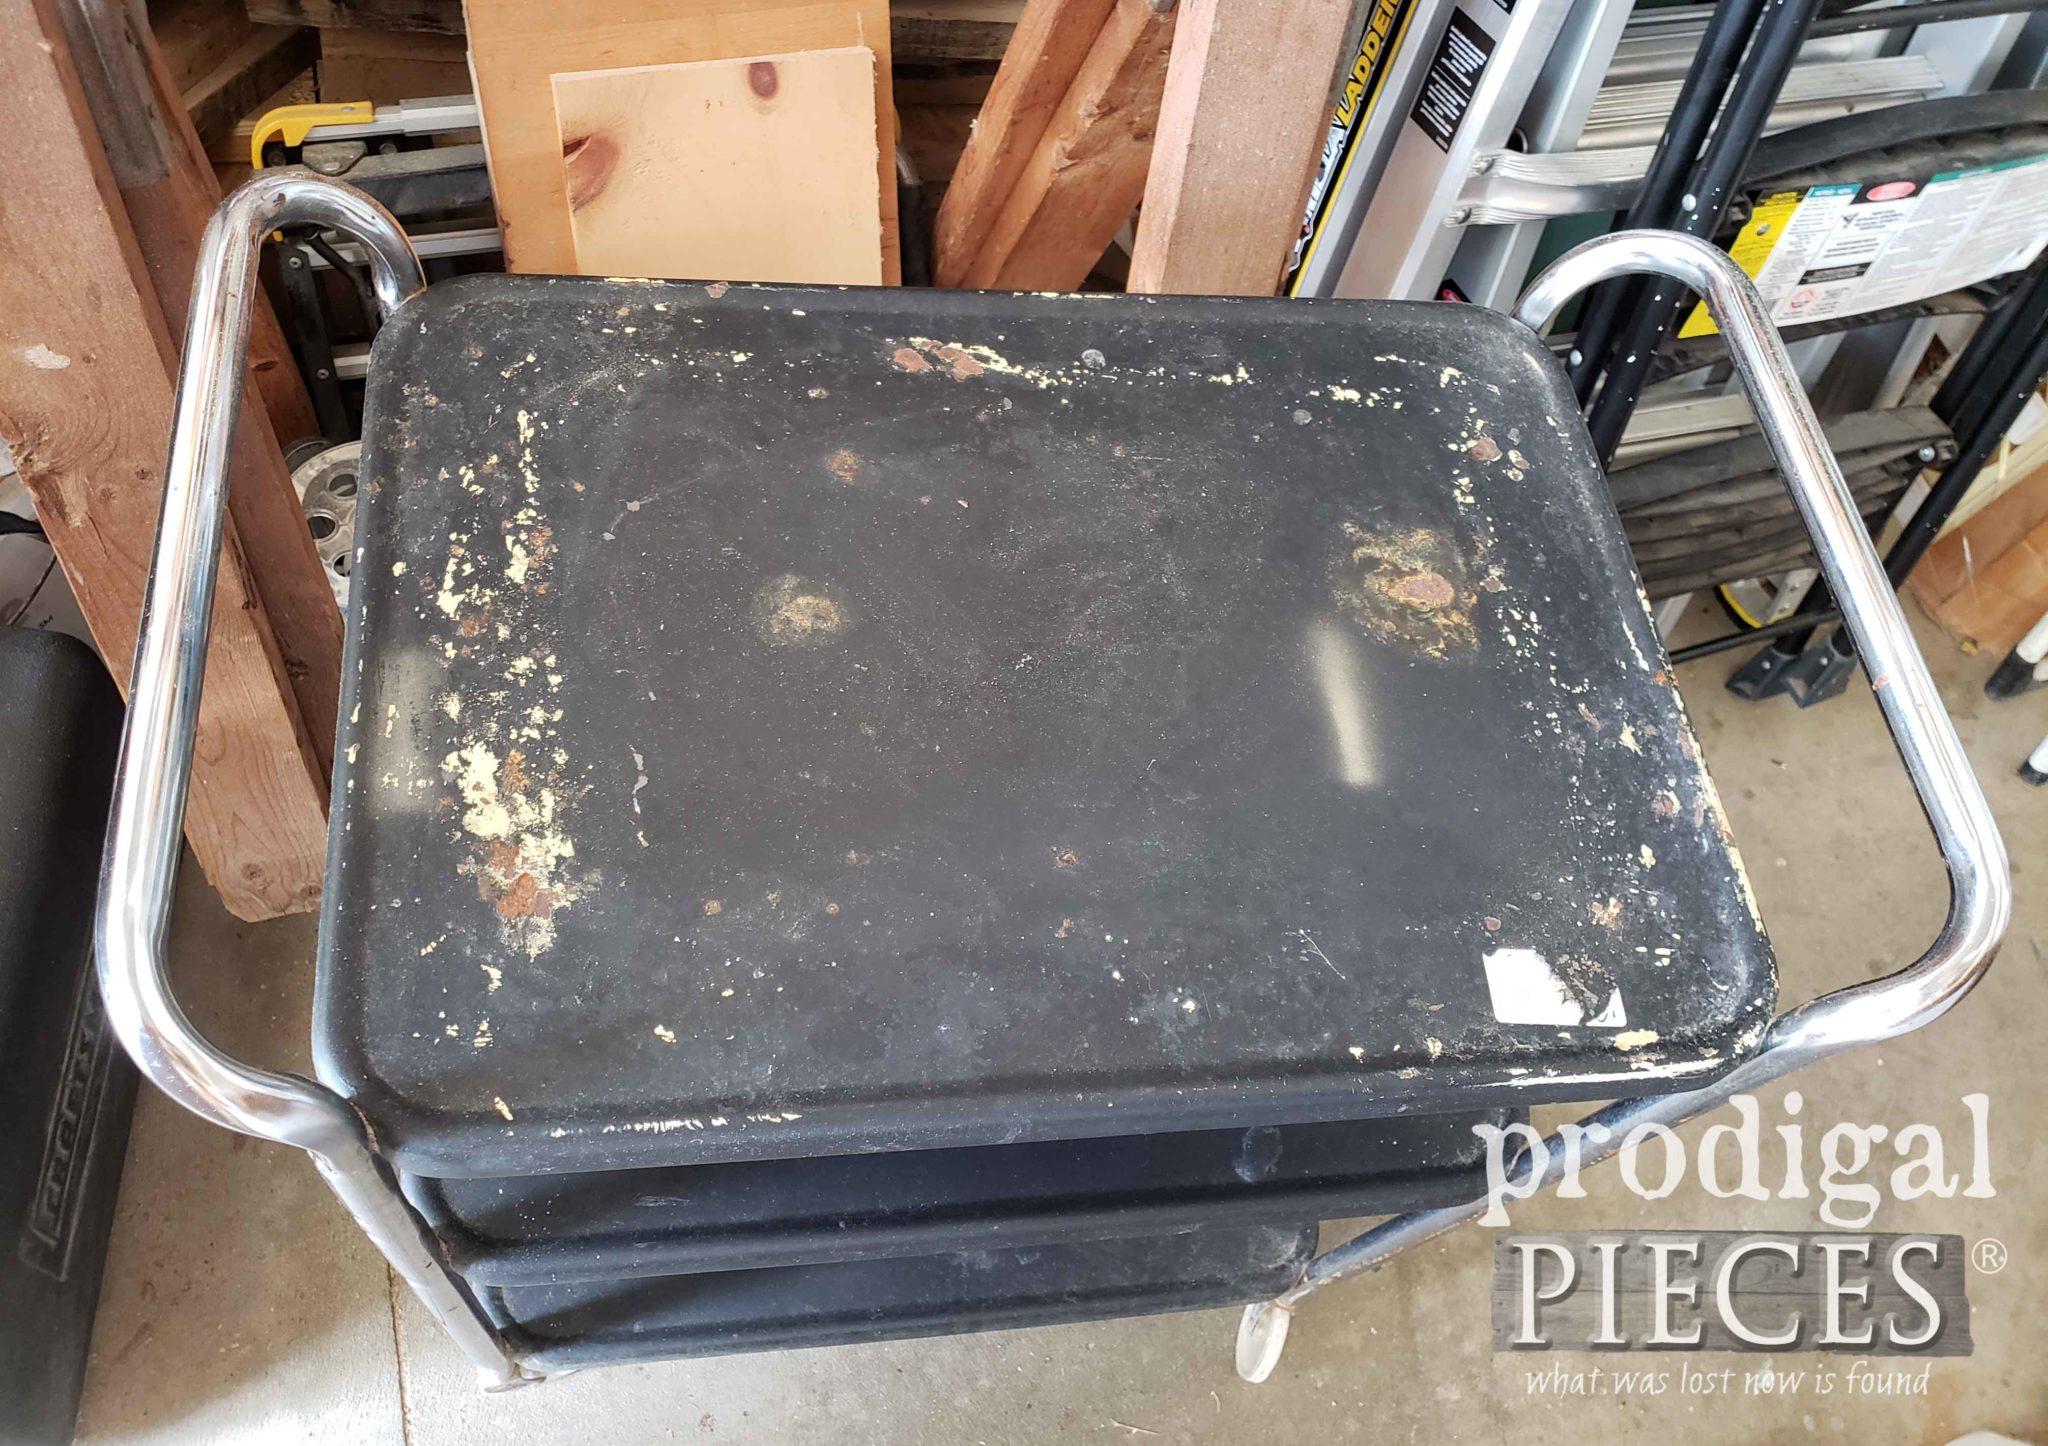 Damaged Vintage Cosco Cart Top Before | prodigalpieces.com